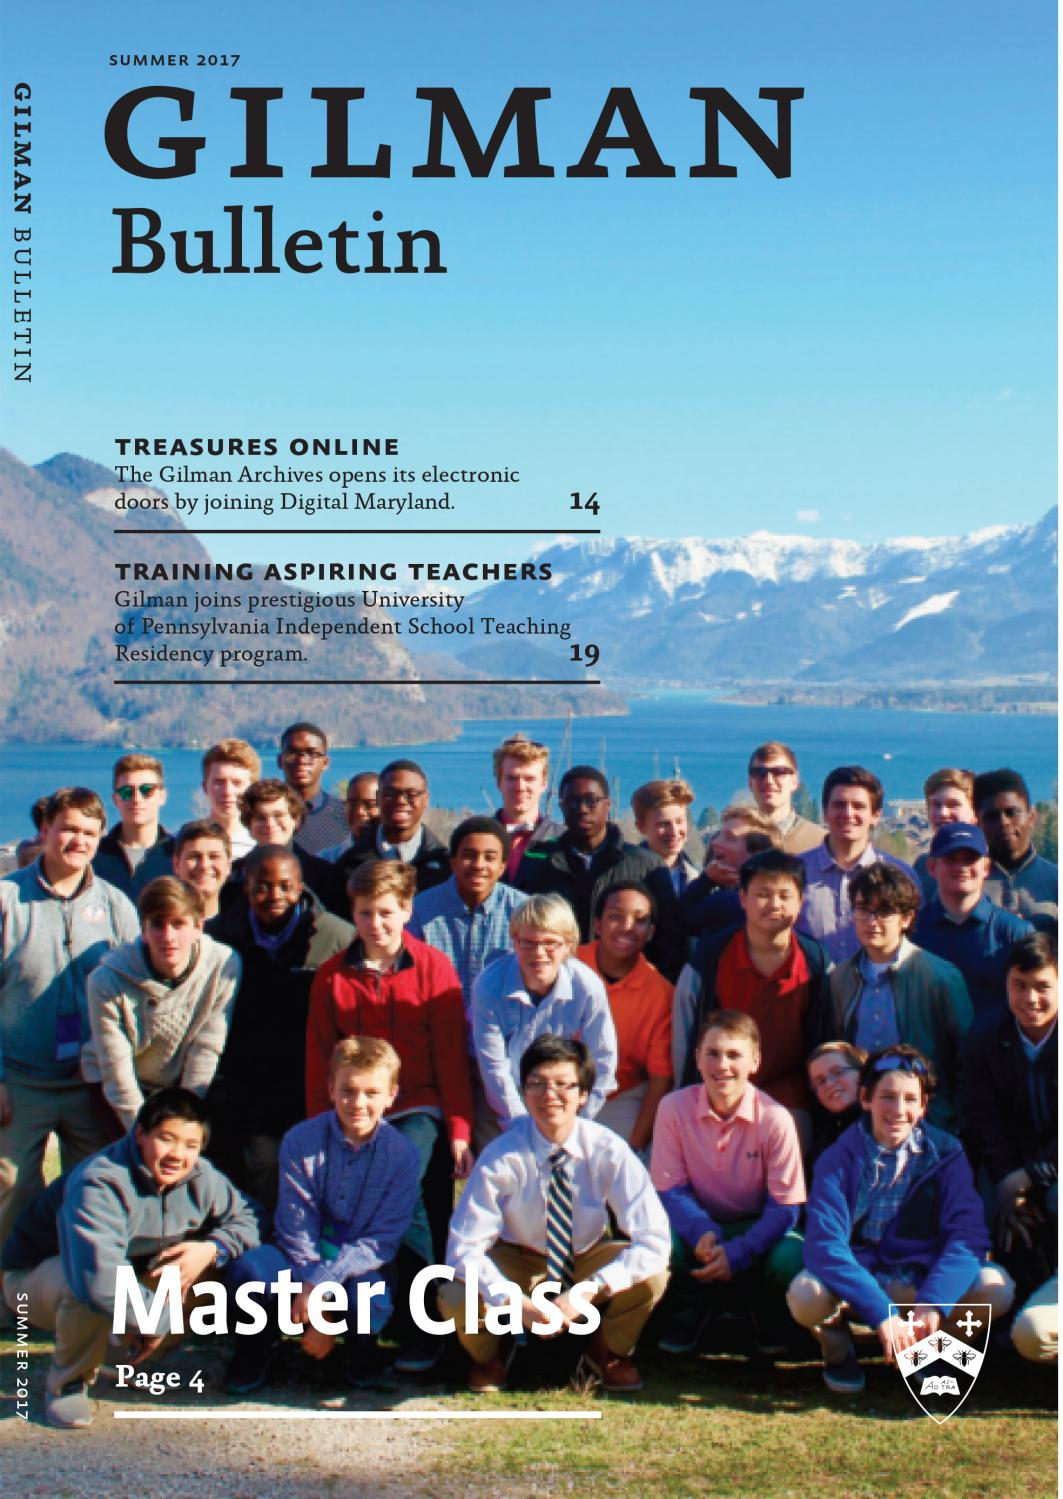 Fall 2017 Gilman Bulletin by Gilman School - issuu